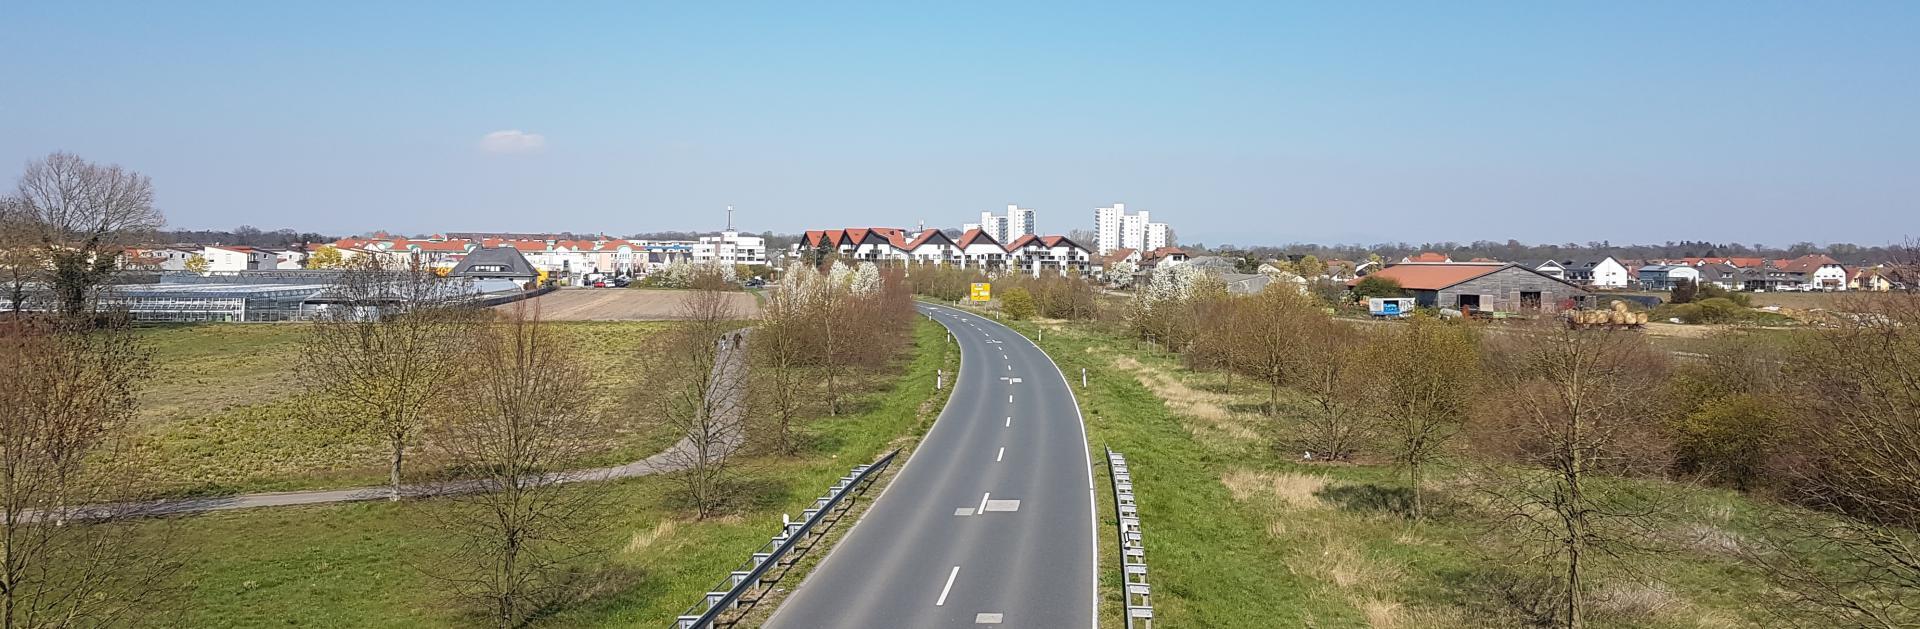 Panorama Nauheim